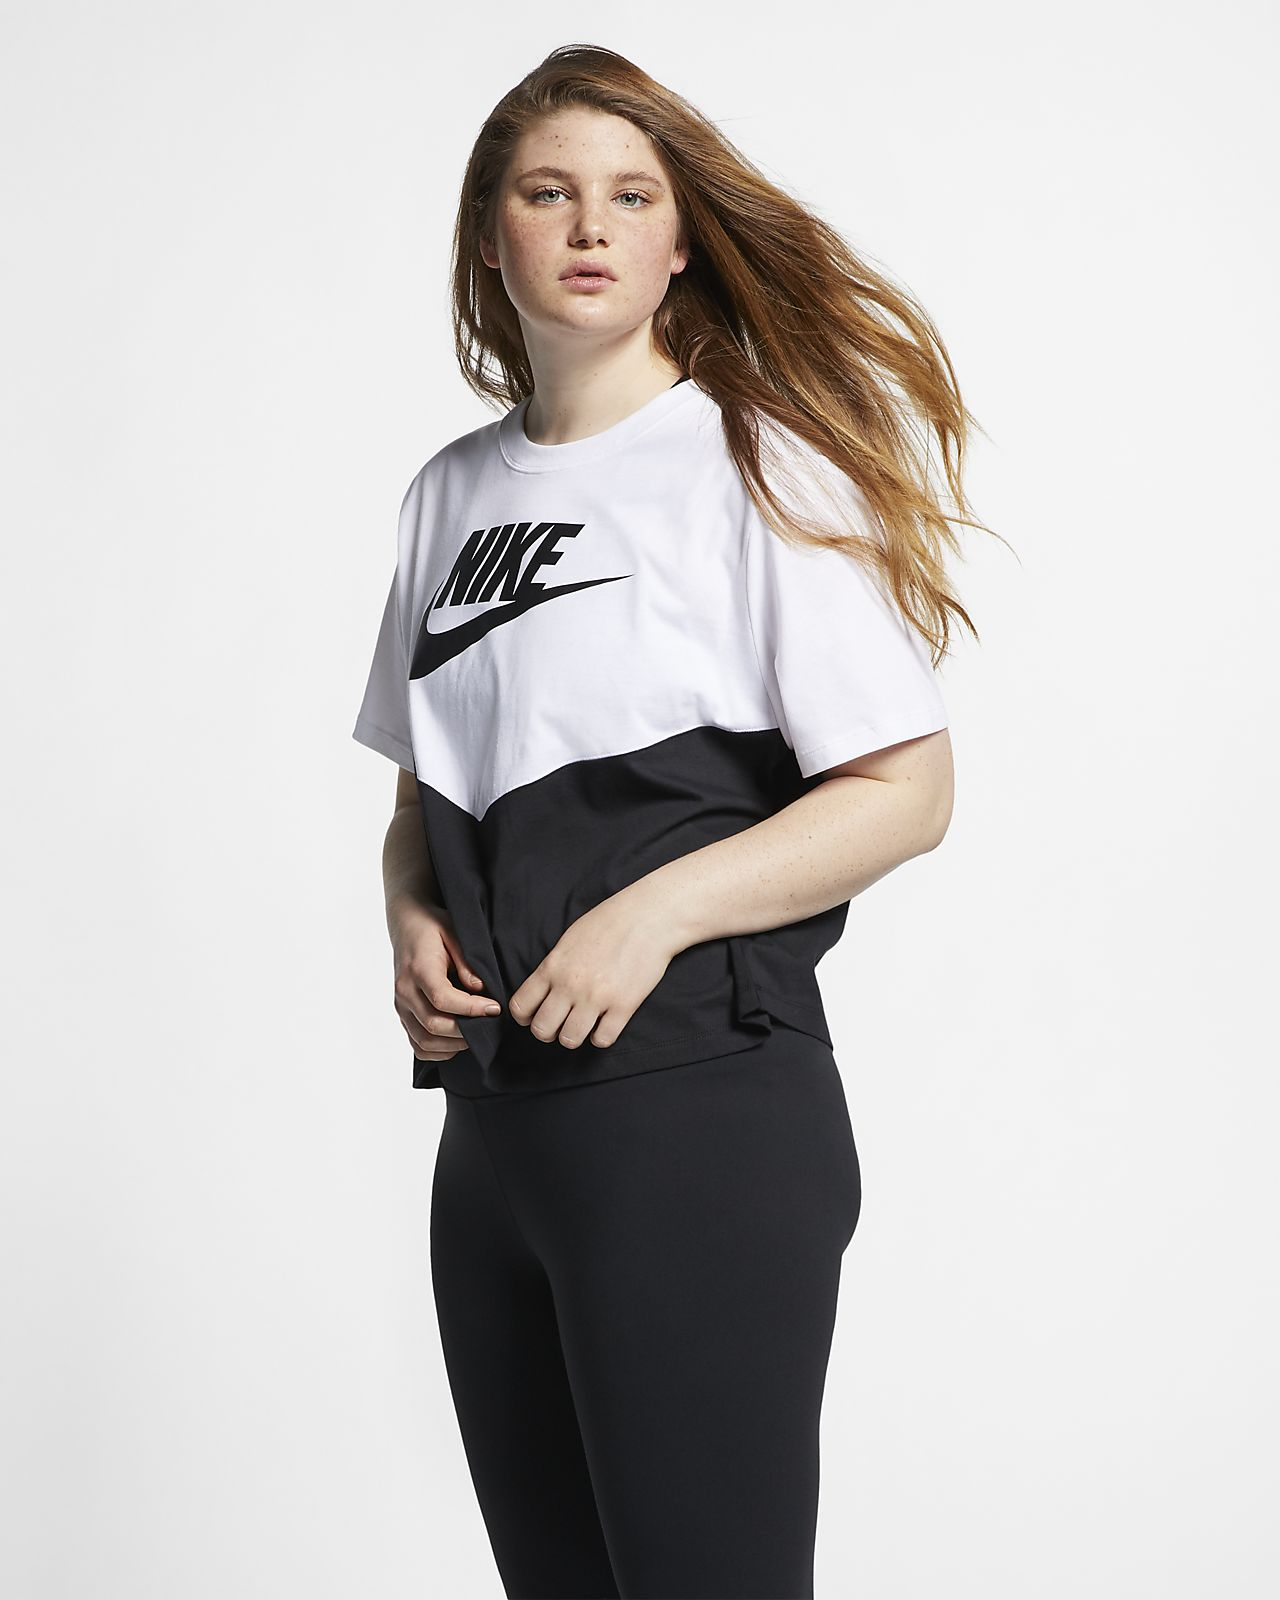 Manica Corta Grande A Donnatalla Sportswear Nike Top Heritage lFKJT1c3